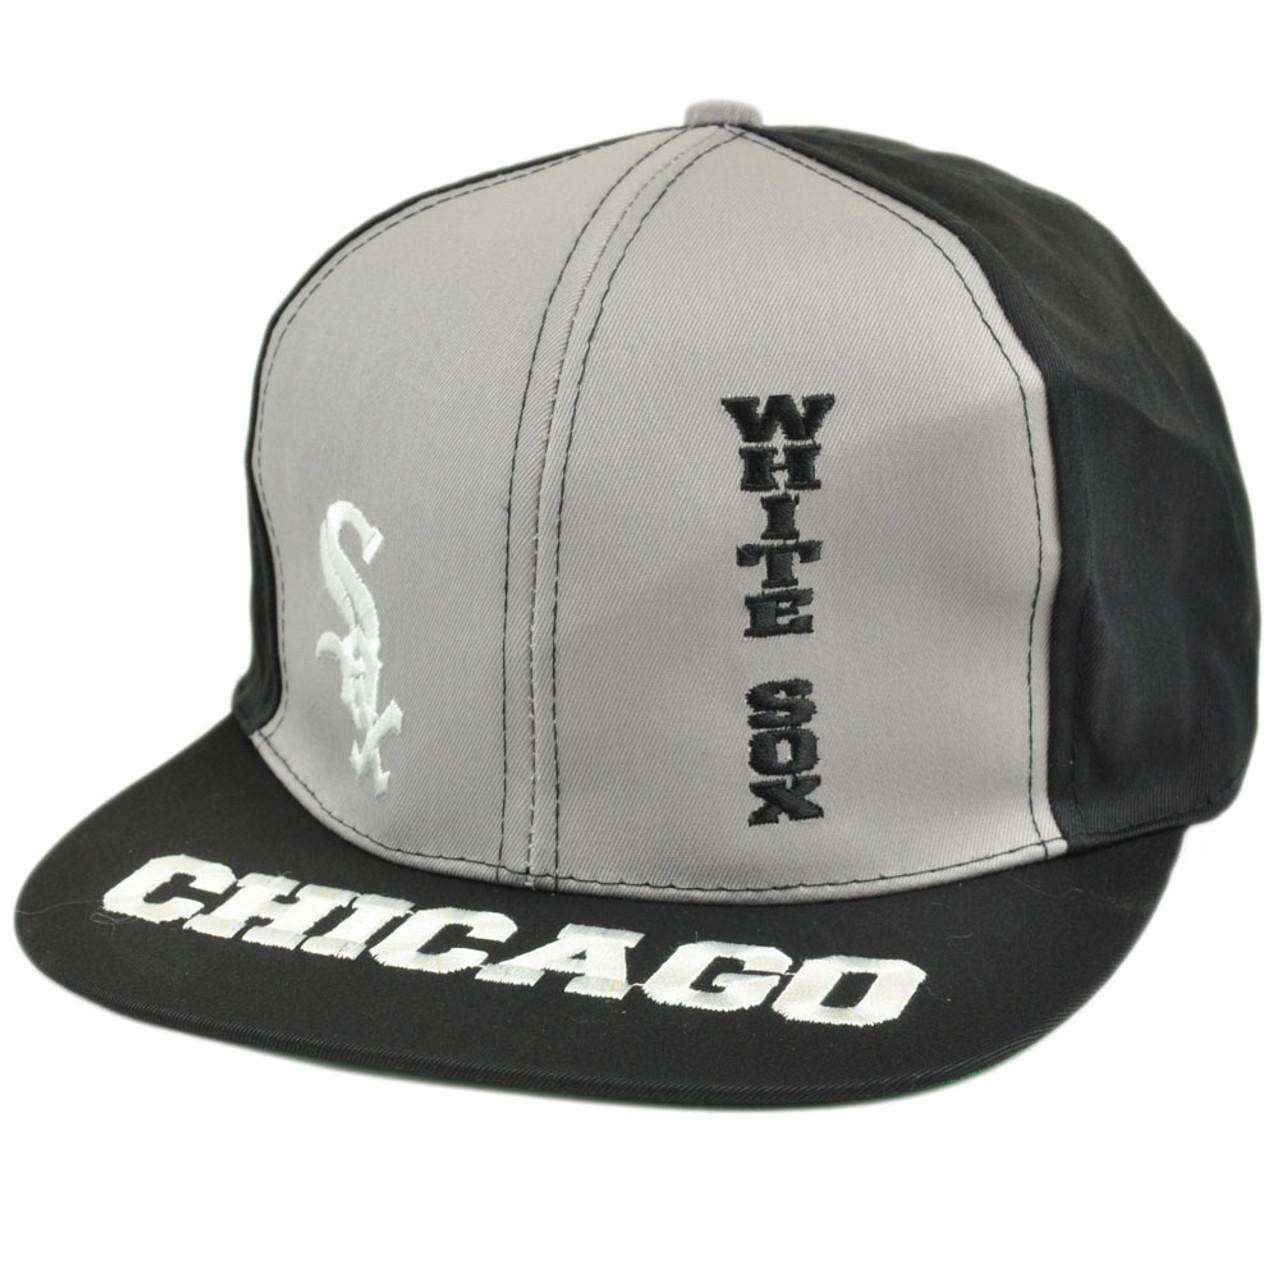 f94fe833dfd303 MLB Chicago White Sox Vintage Old School Snapback Flat Bill Hat Cap Drew  Pearson - Cap Store Online.com